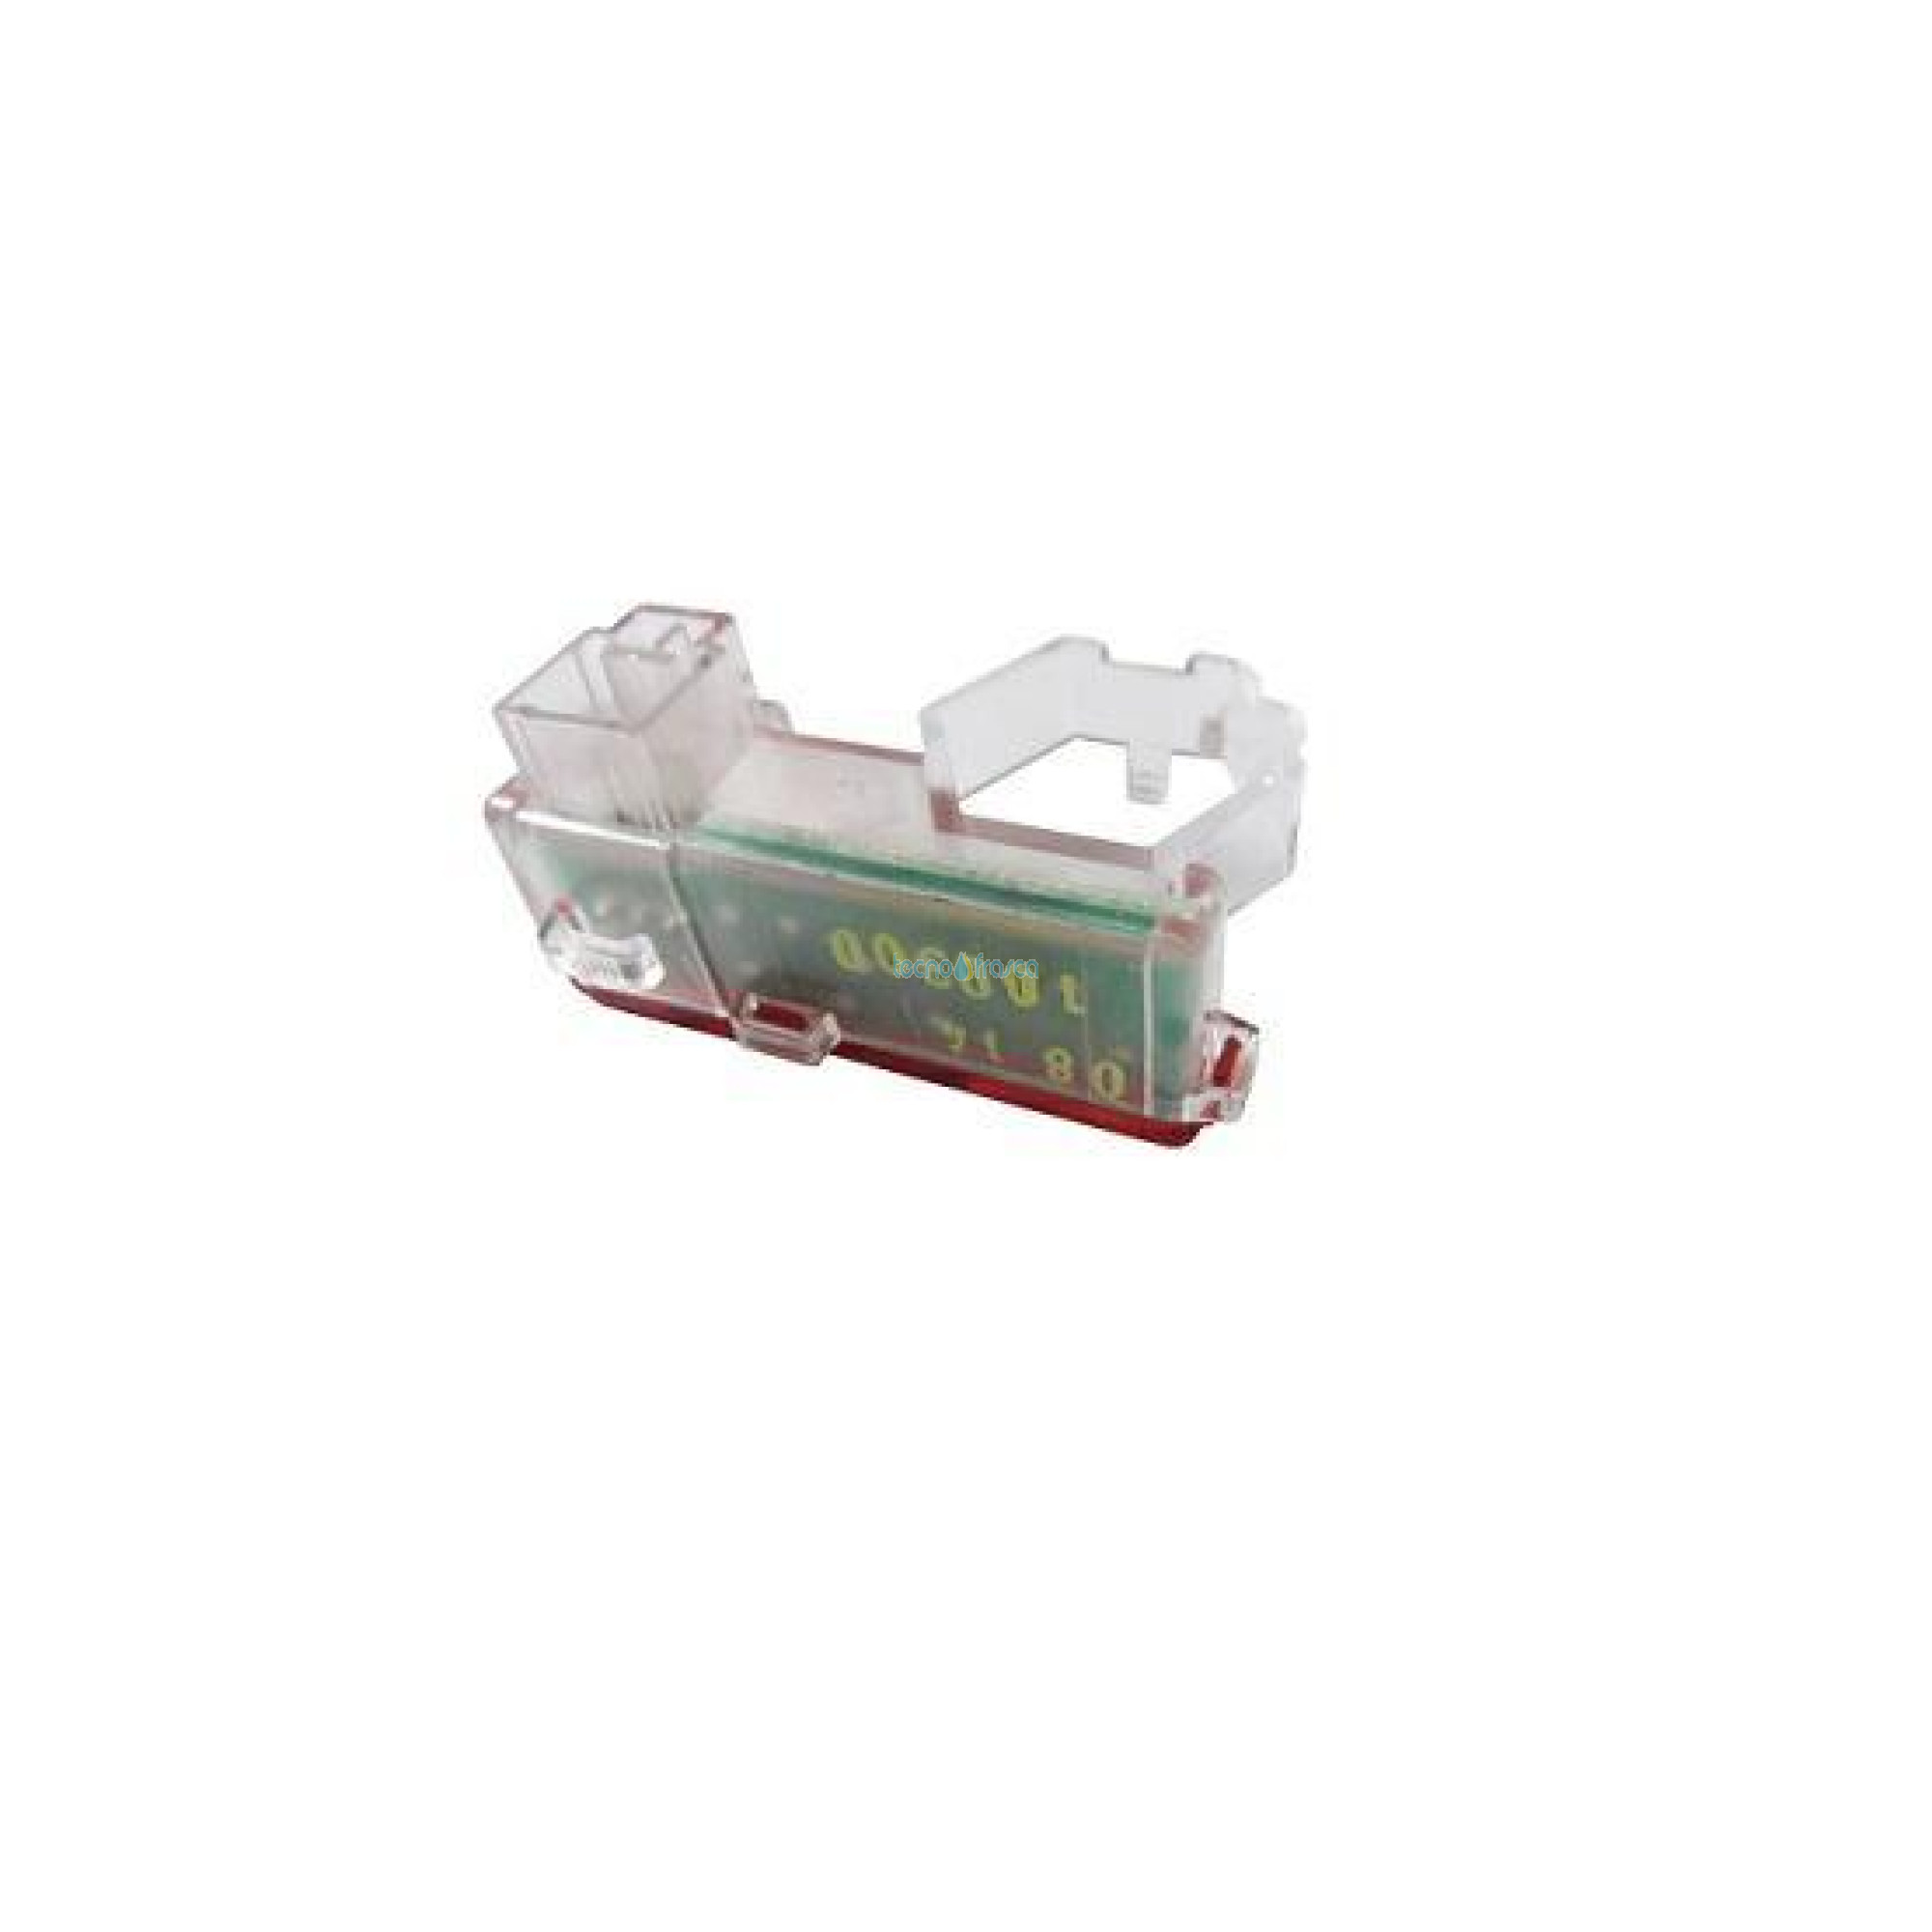 Rilevatore magnetico baxi 100274